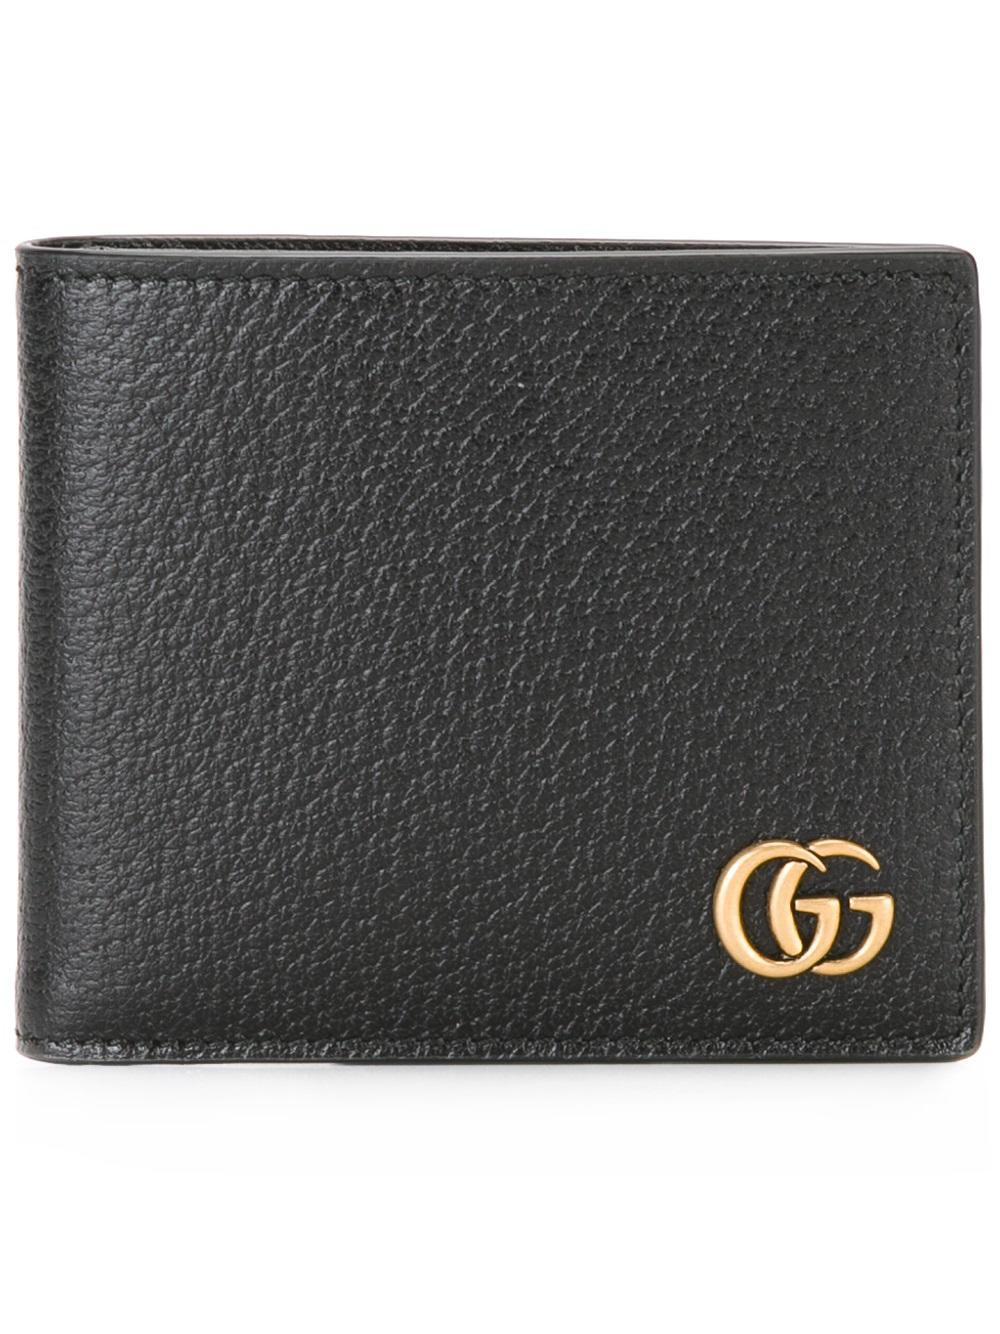 Gucci Gg Marmont Billfold Wallet In Black For Men Lyst